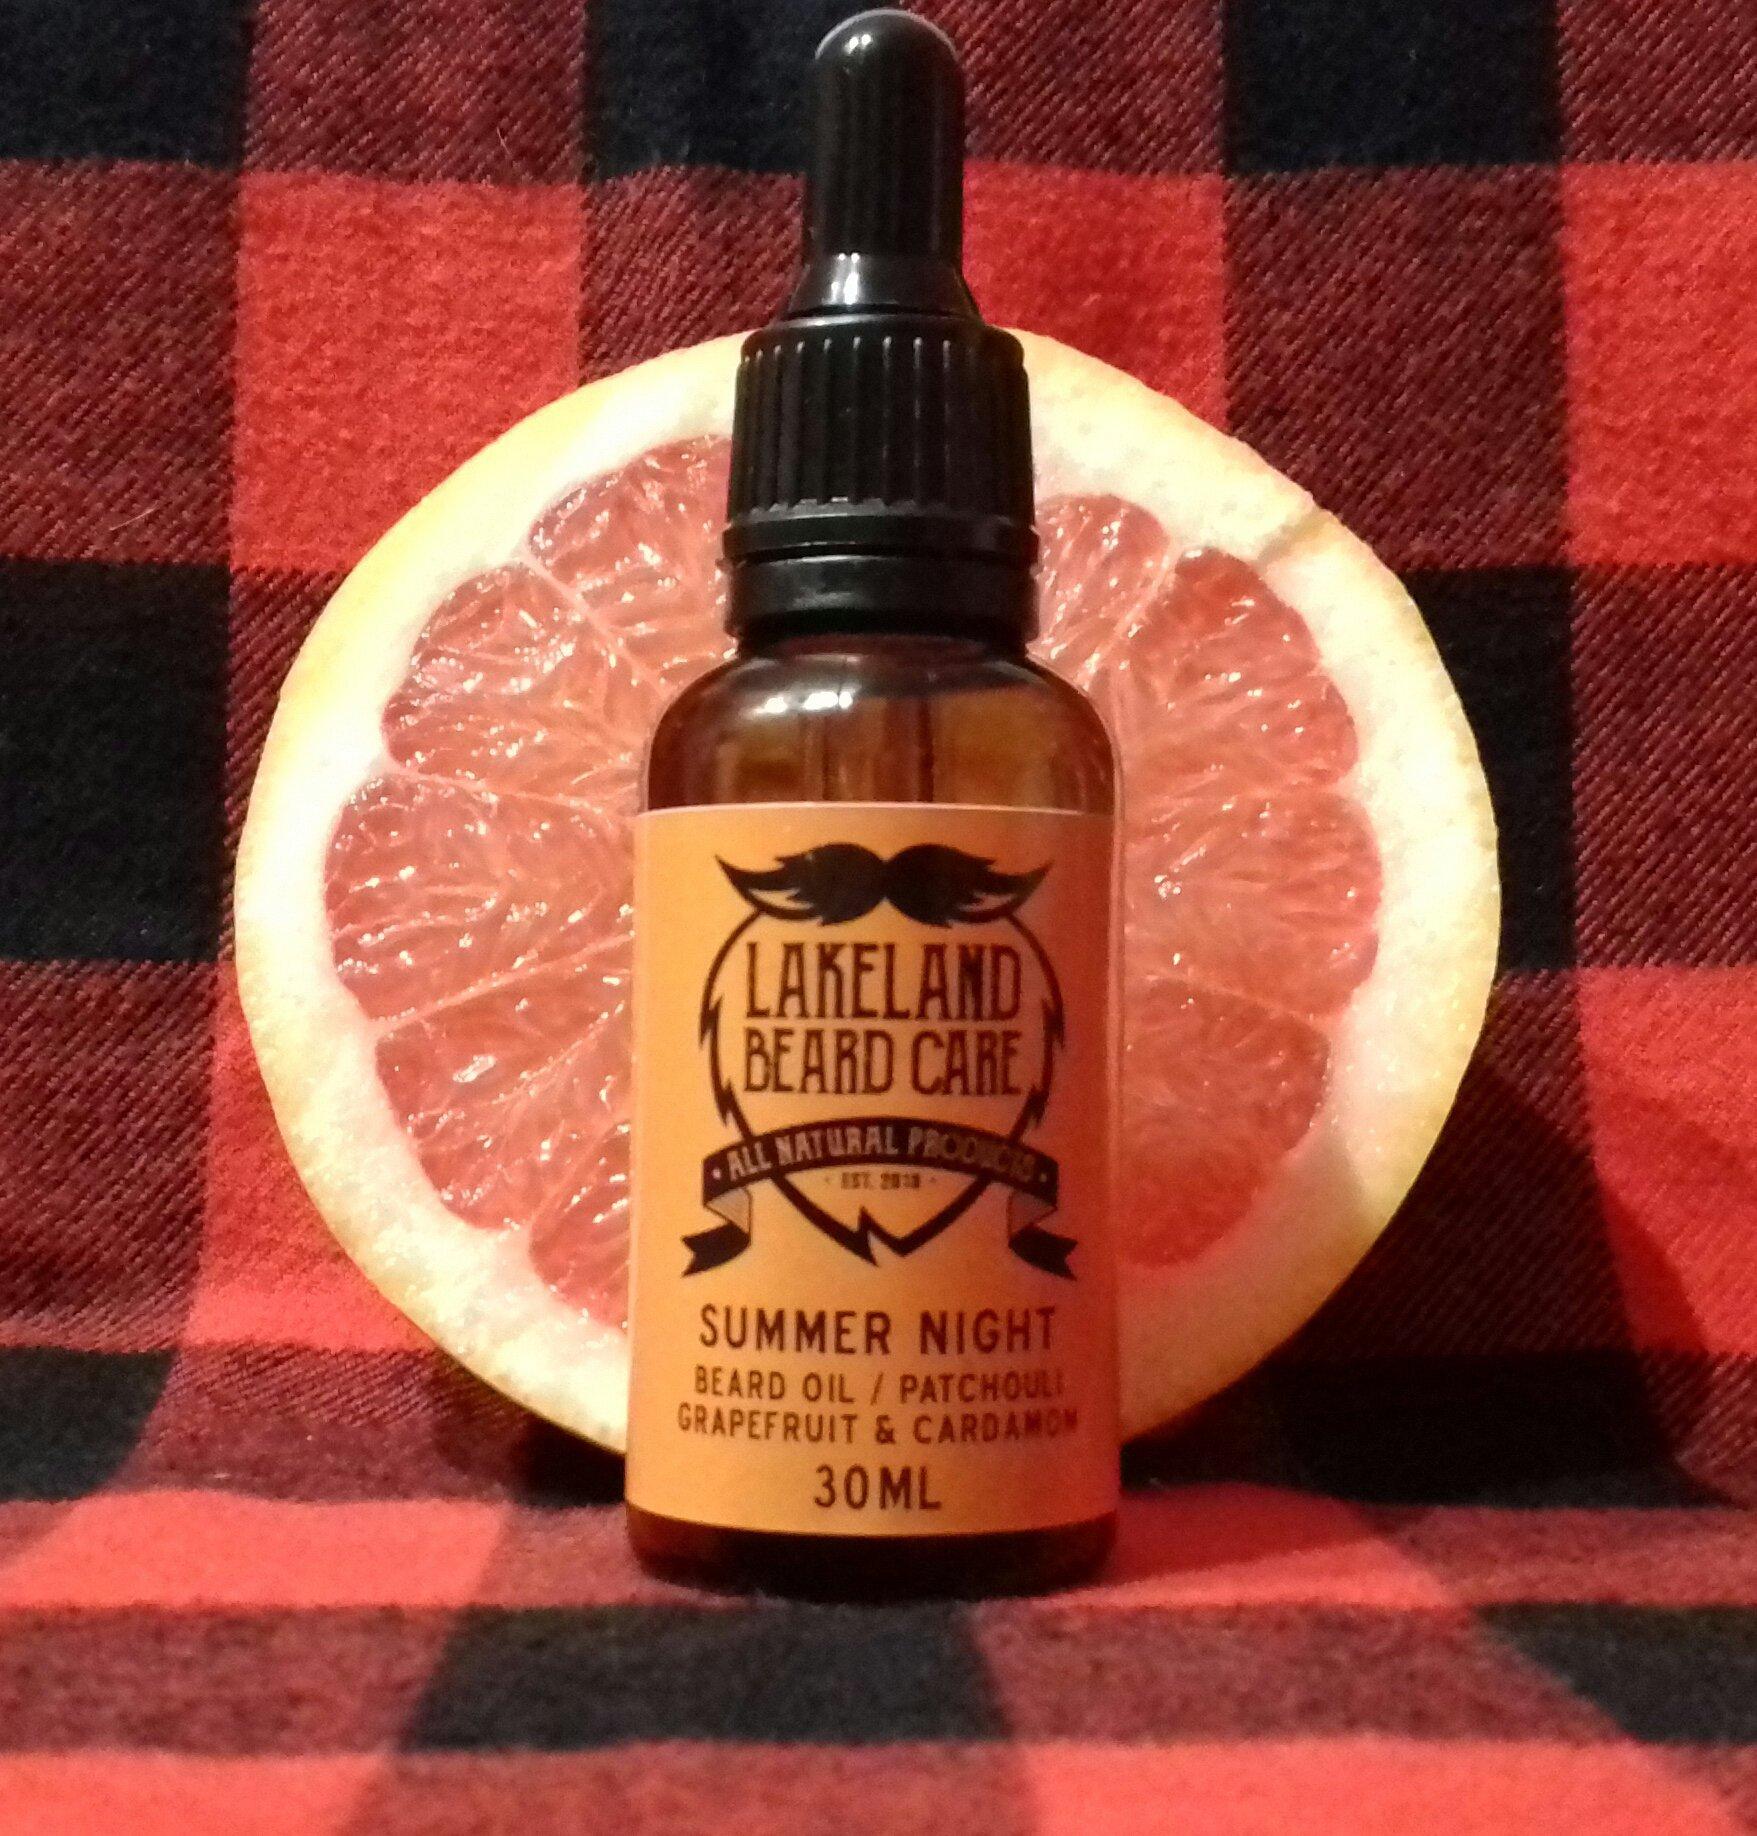 Review of the Lakeland Beard Care Summer Night Beard Oil